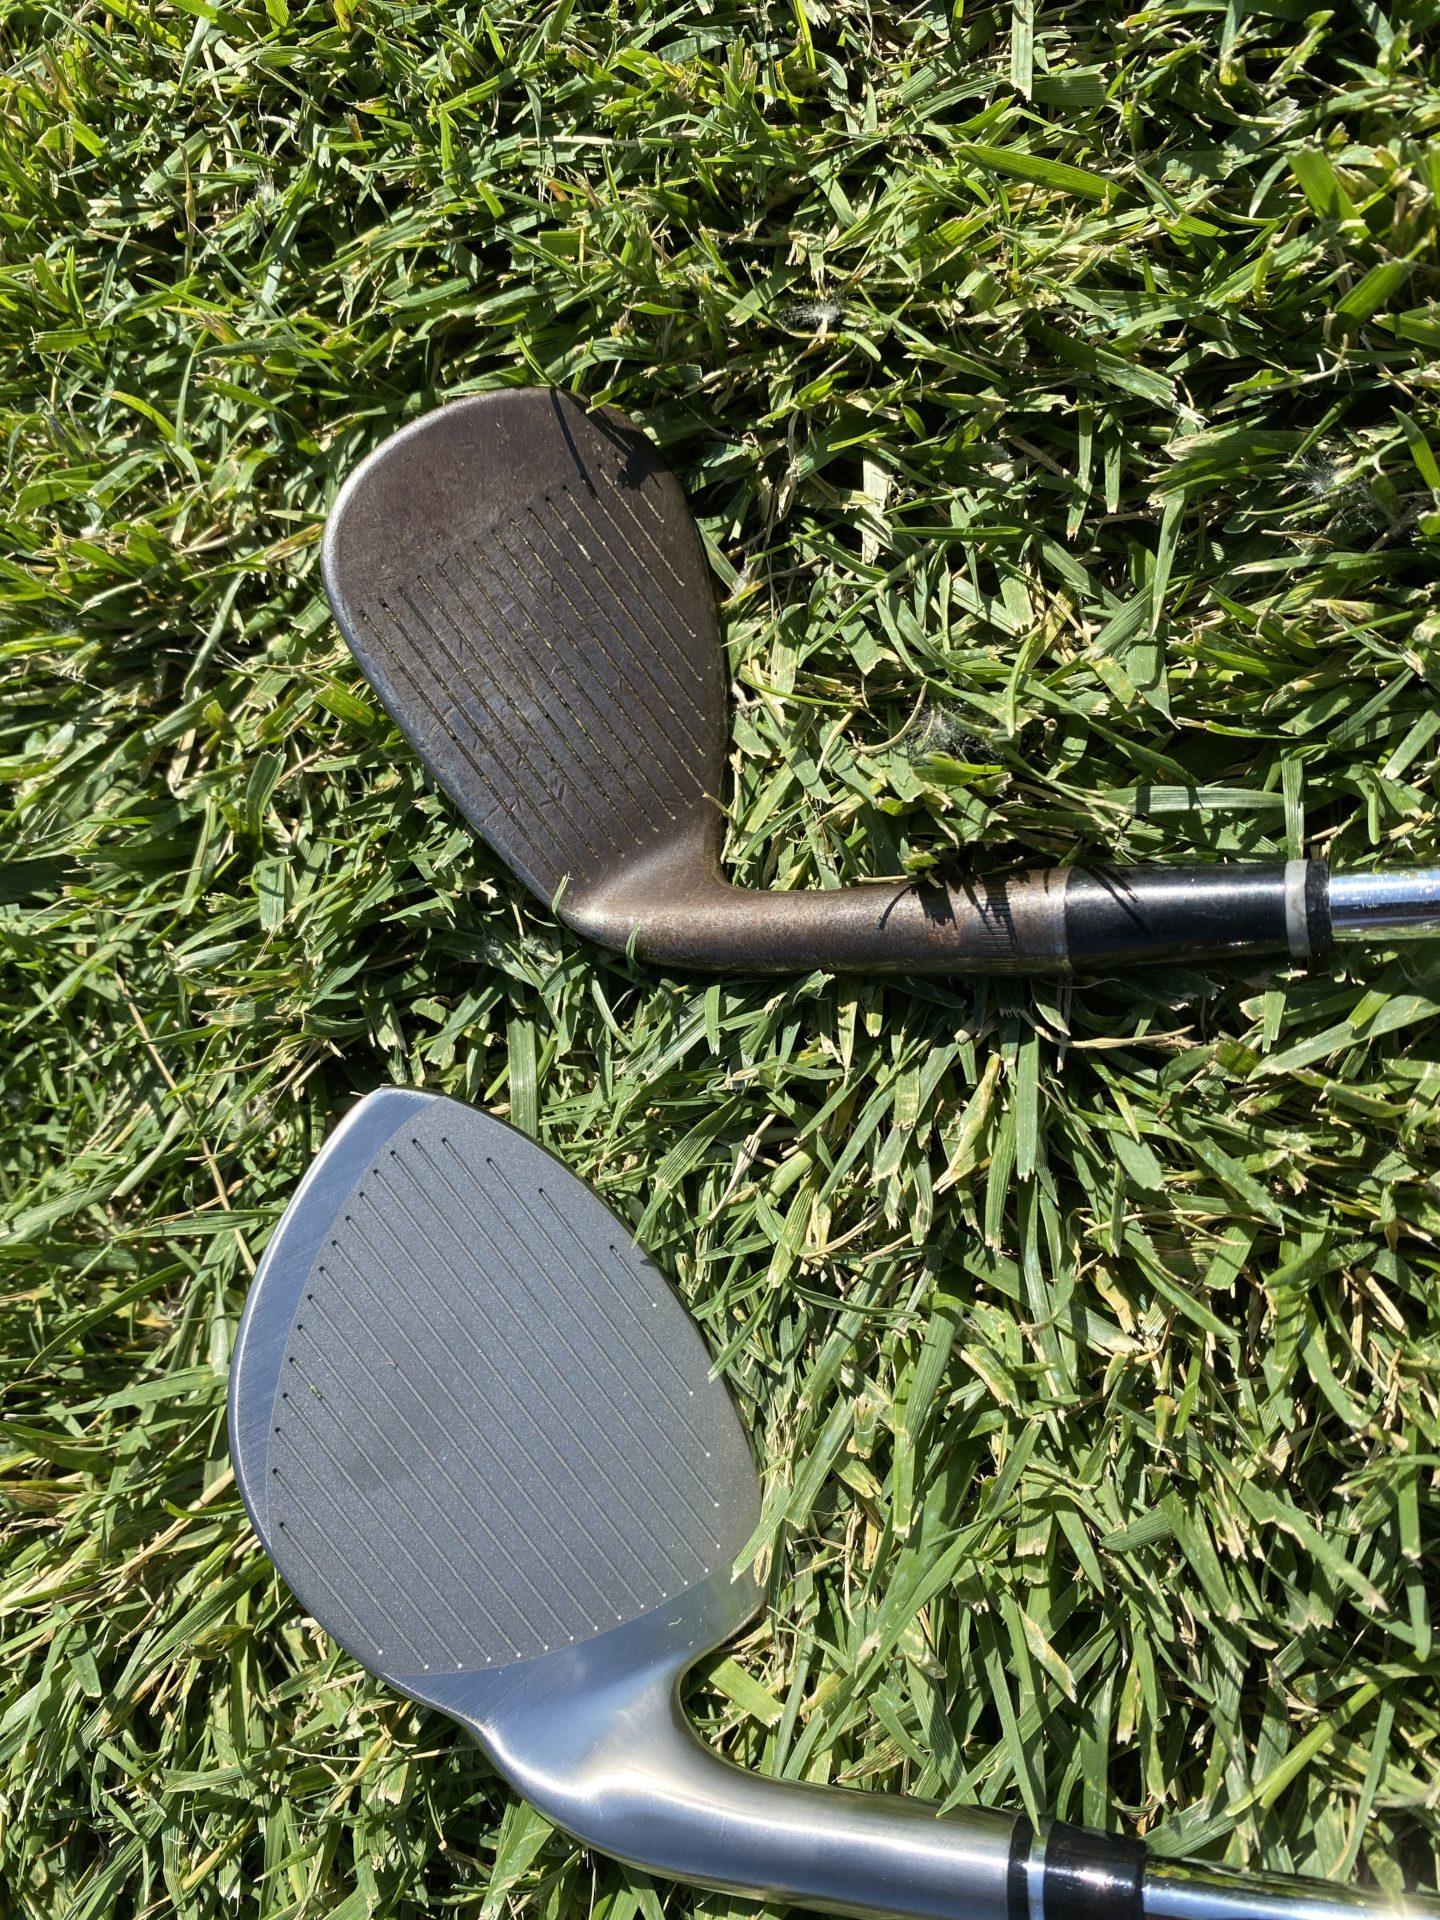 Cutter Golf 52 Degree Wedge